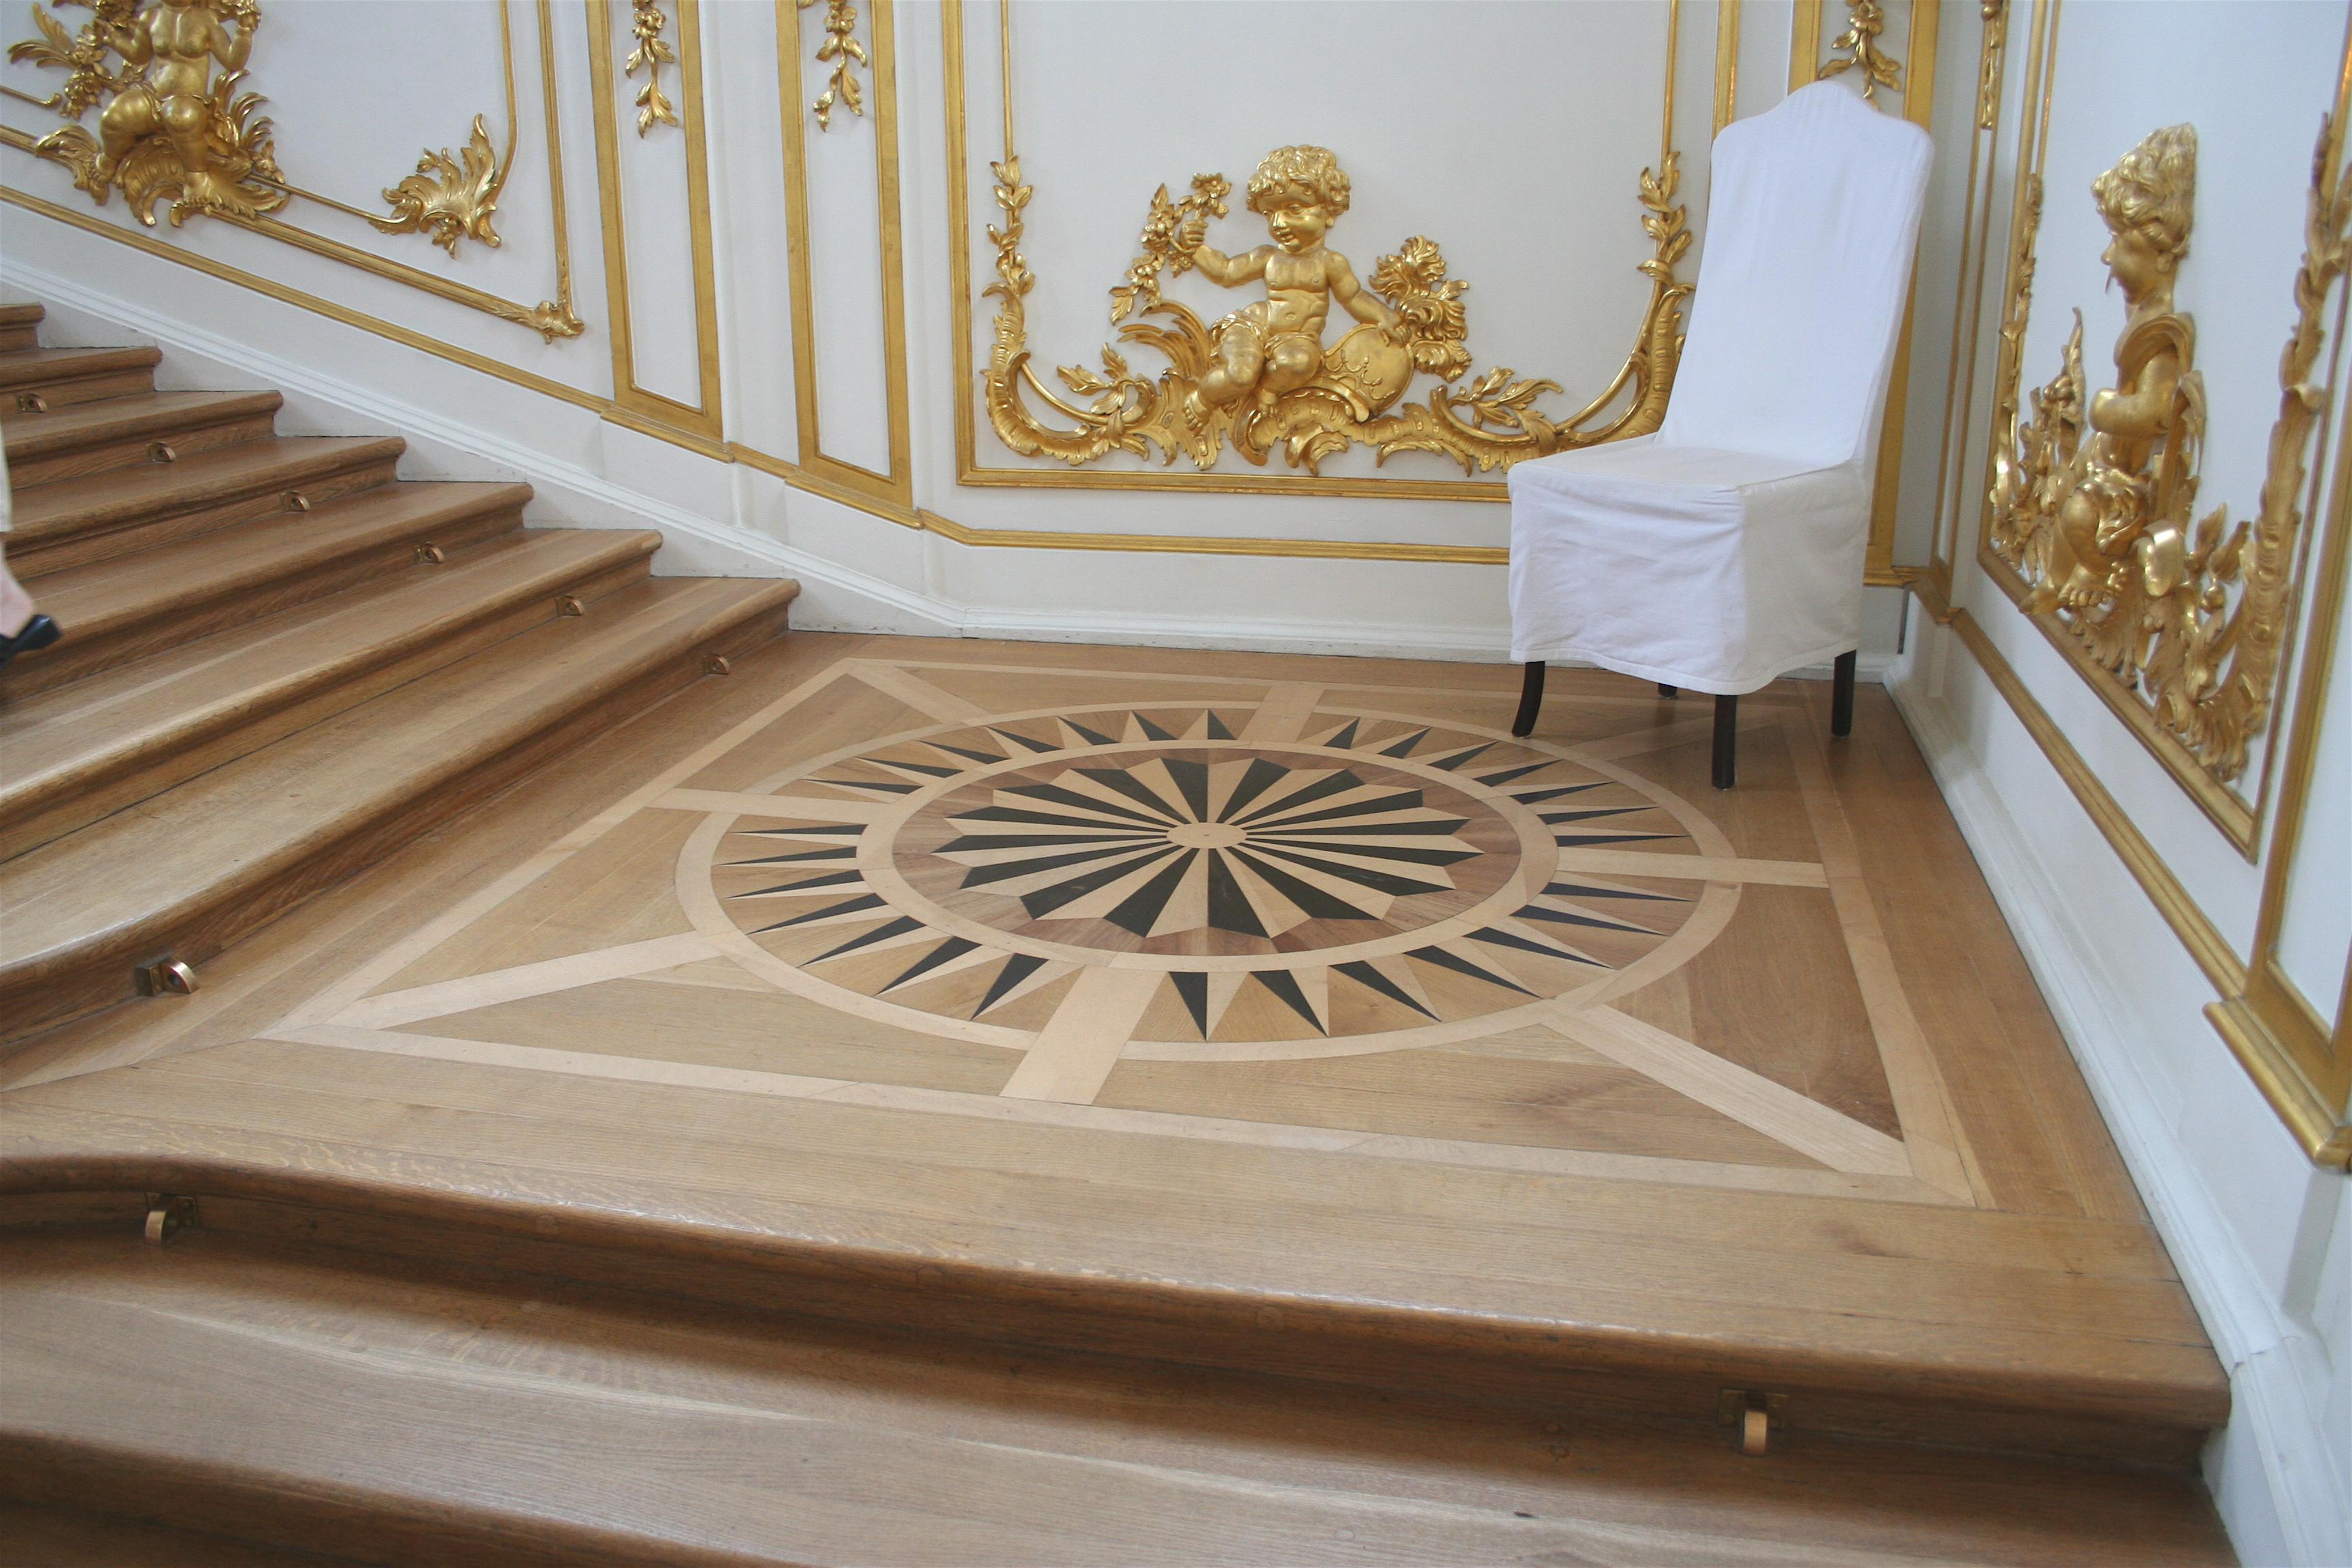 Parquet flooring hardwood floor border medallion inlays for Wood floor medallions